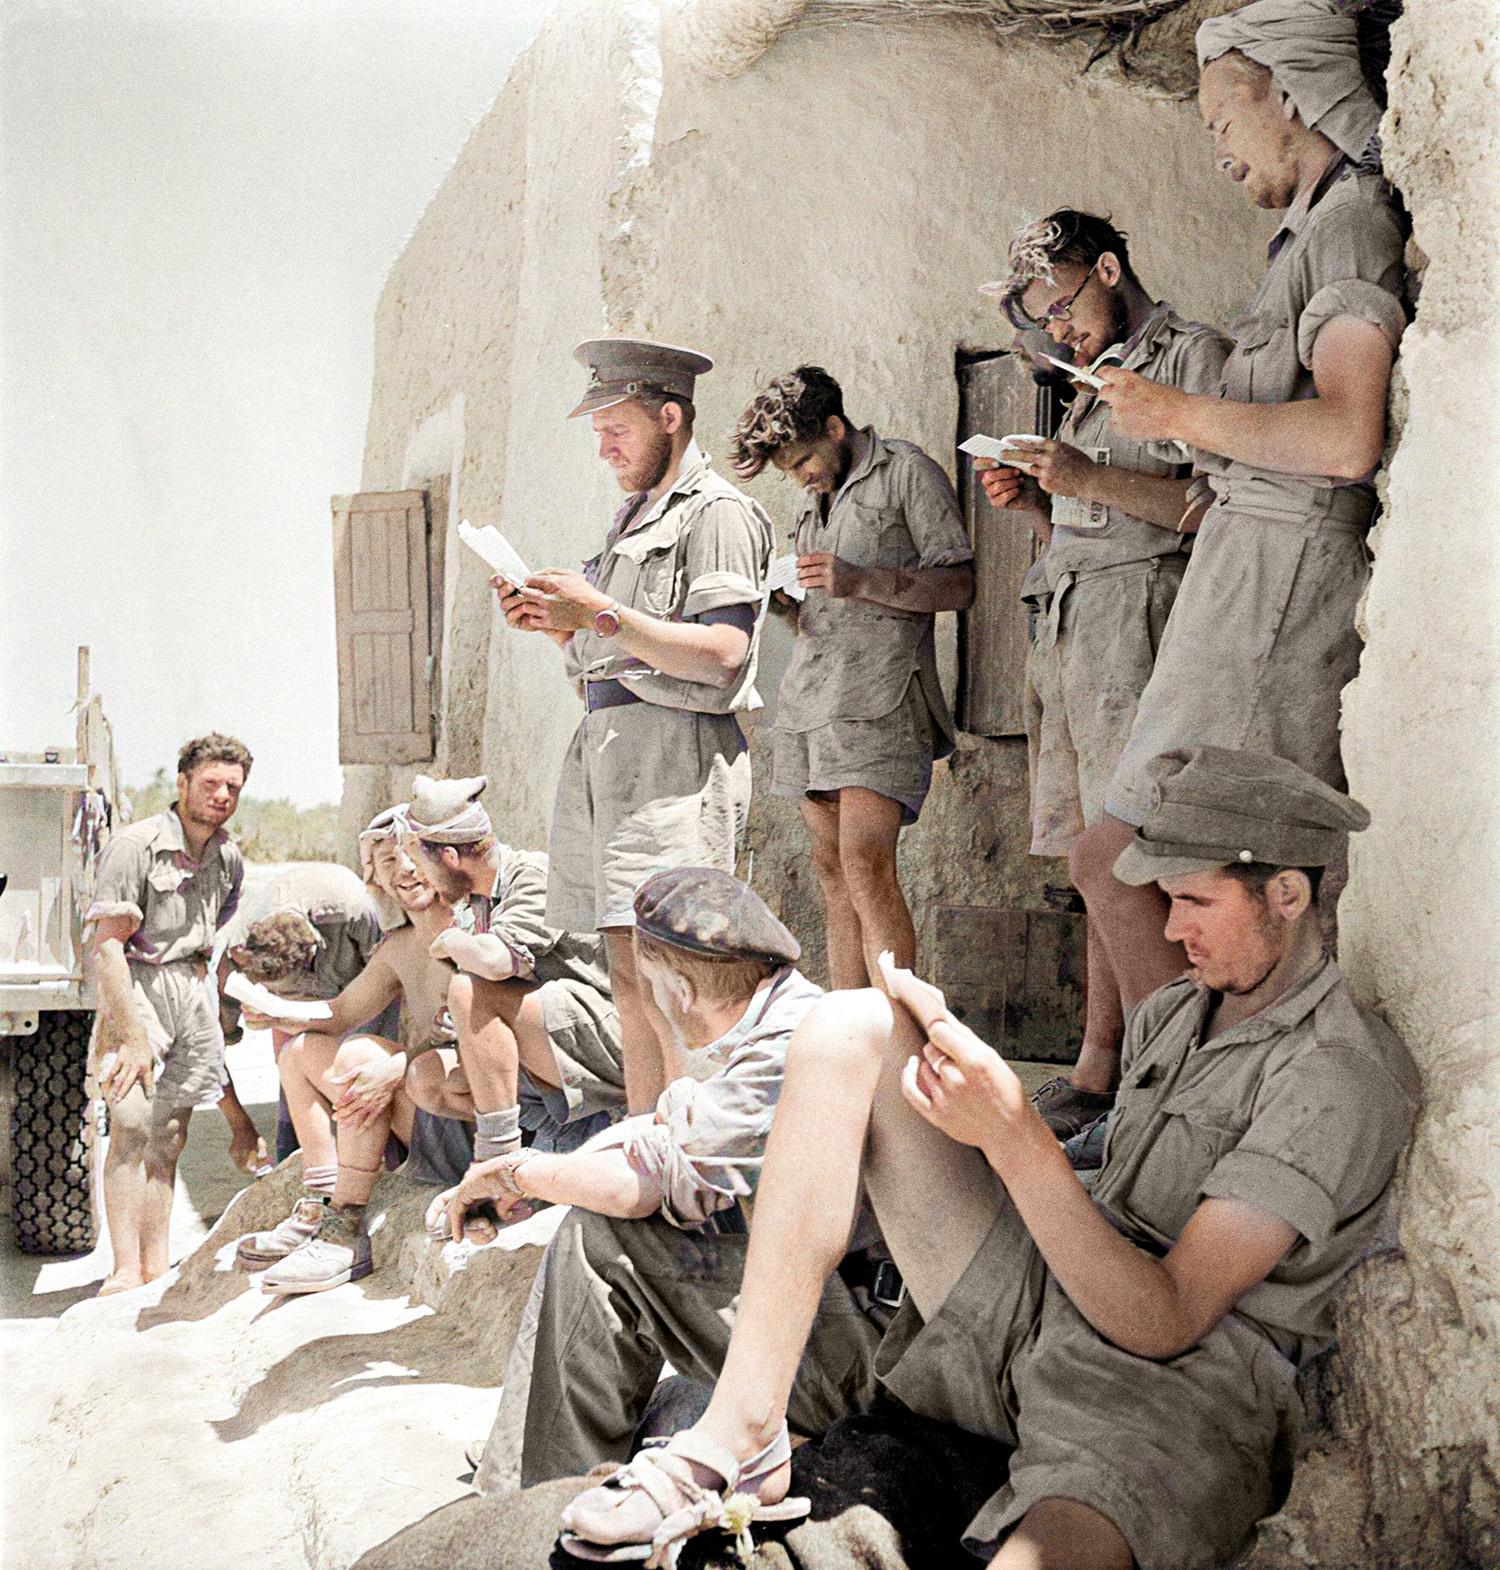 Members of the LRDG showing an eclectic range of headgear